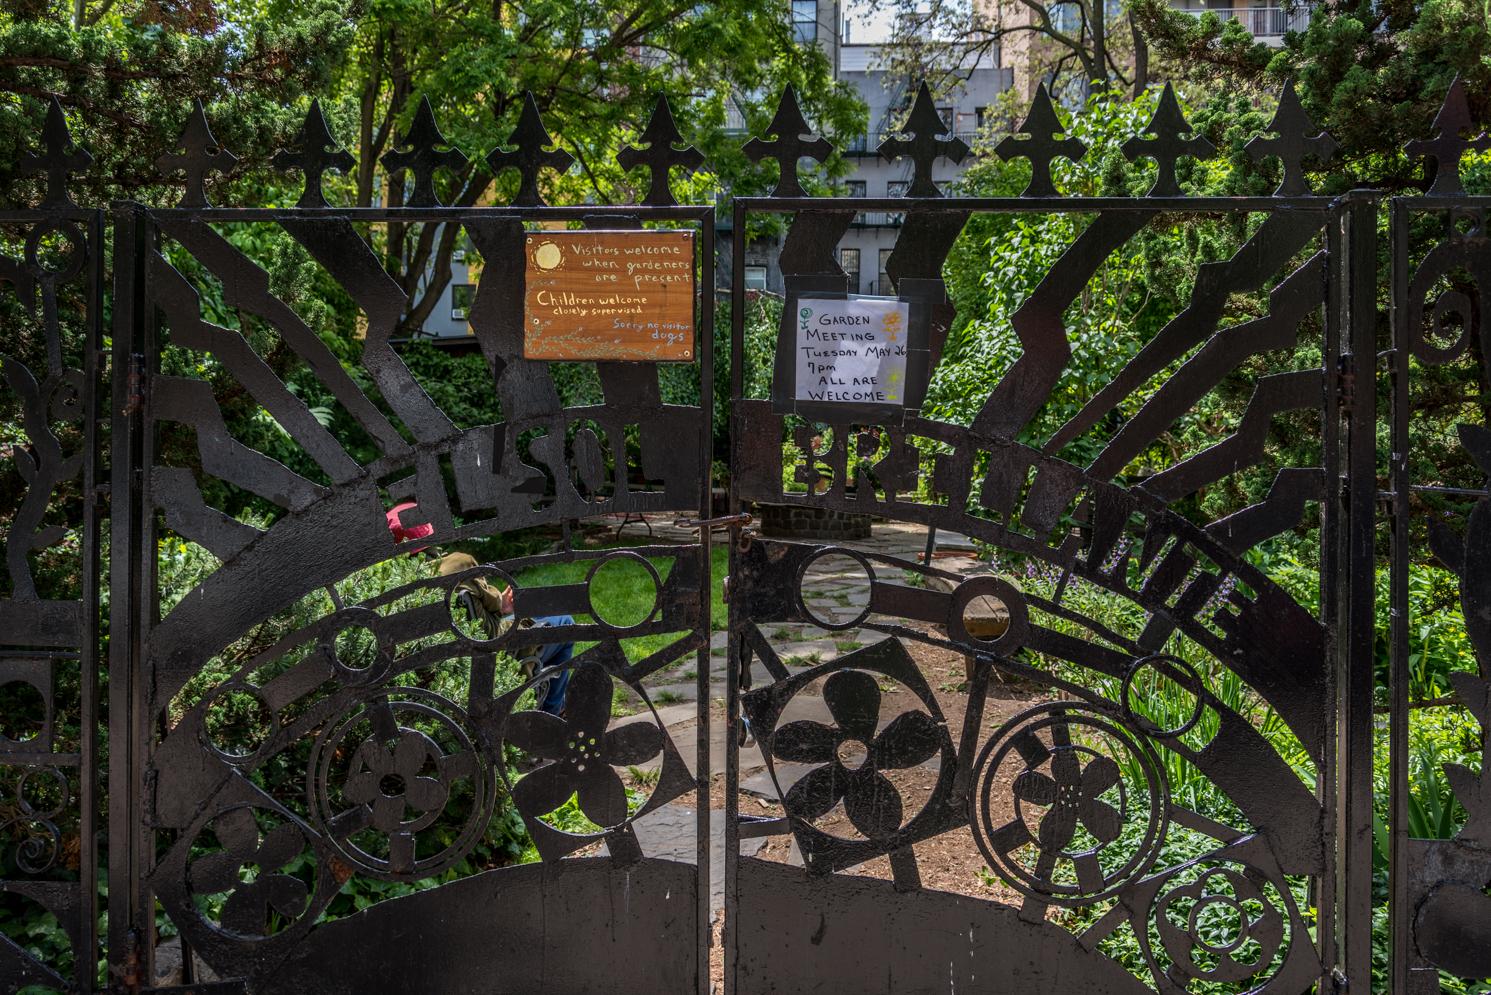 ROCK MAMA NYC LIFESTYLE BLOG - East Village Part 2